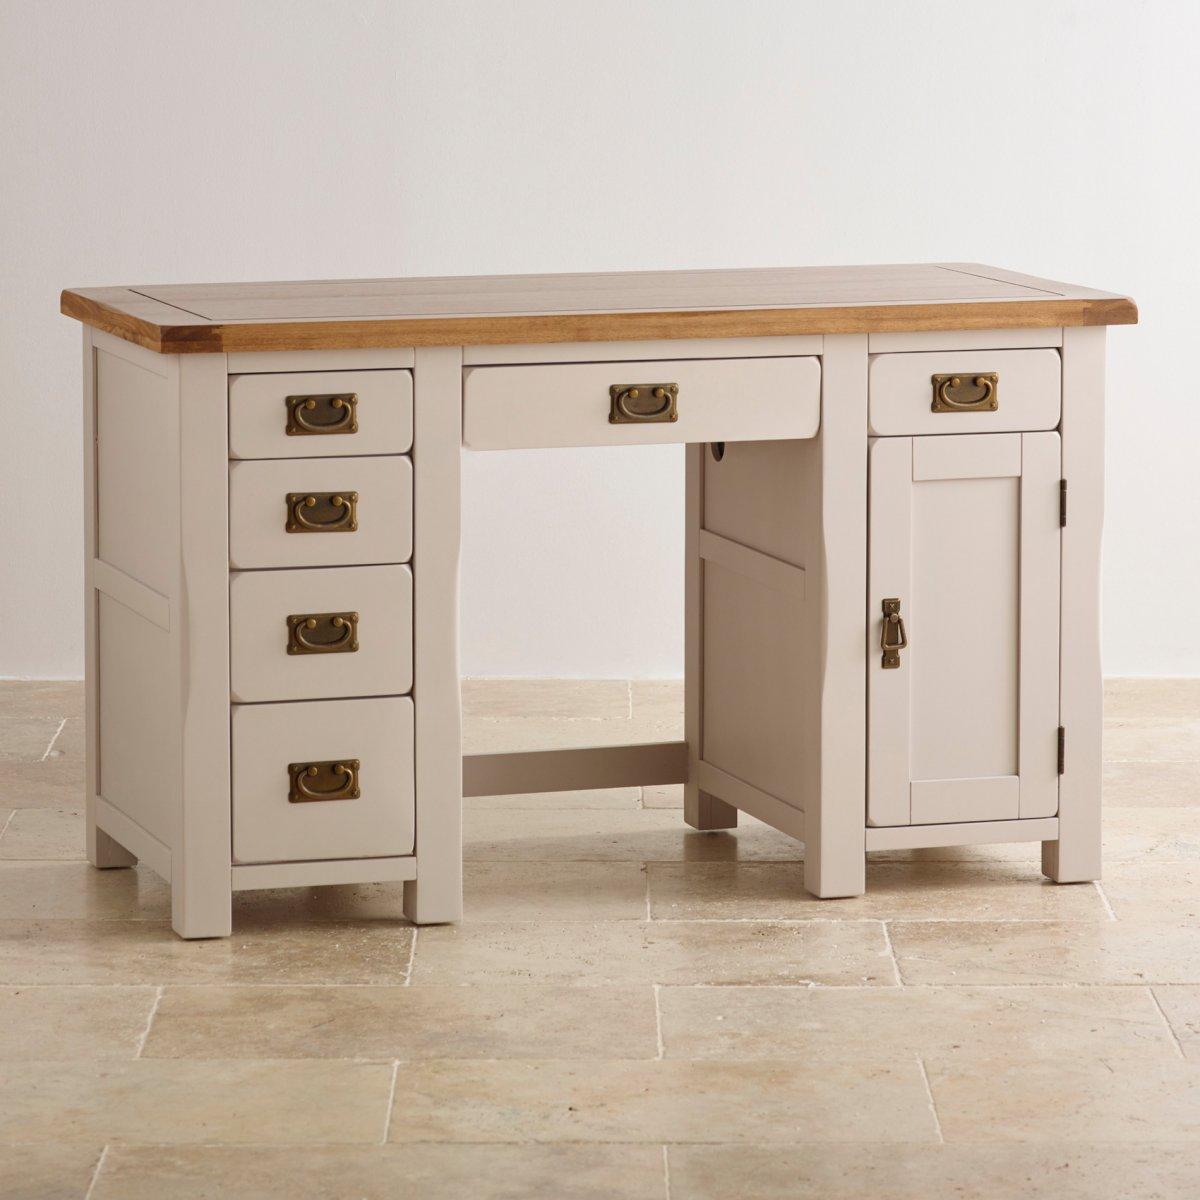 Kemble Painted Computer Desk In Solid Oak Oak Furniture Land